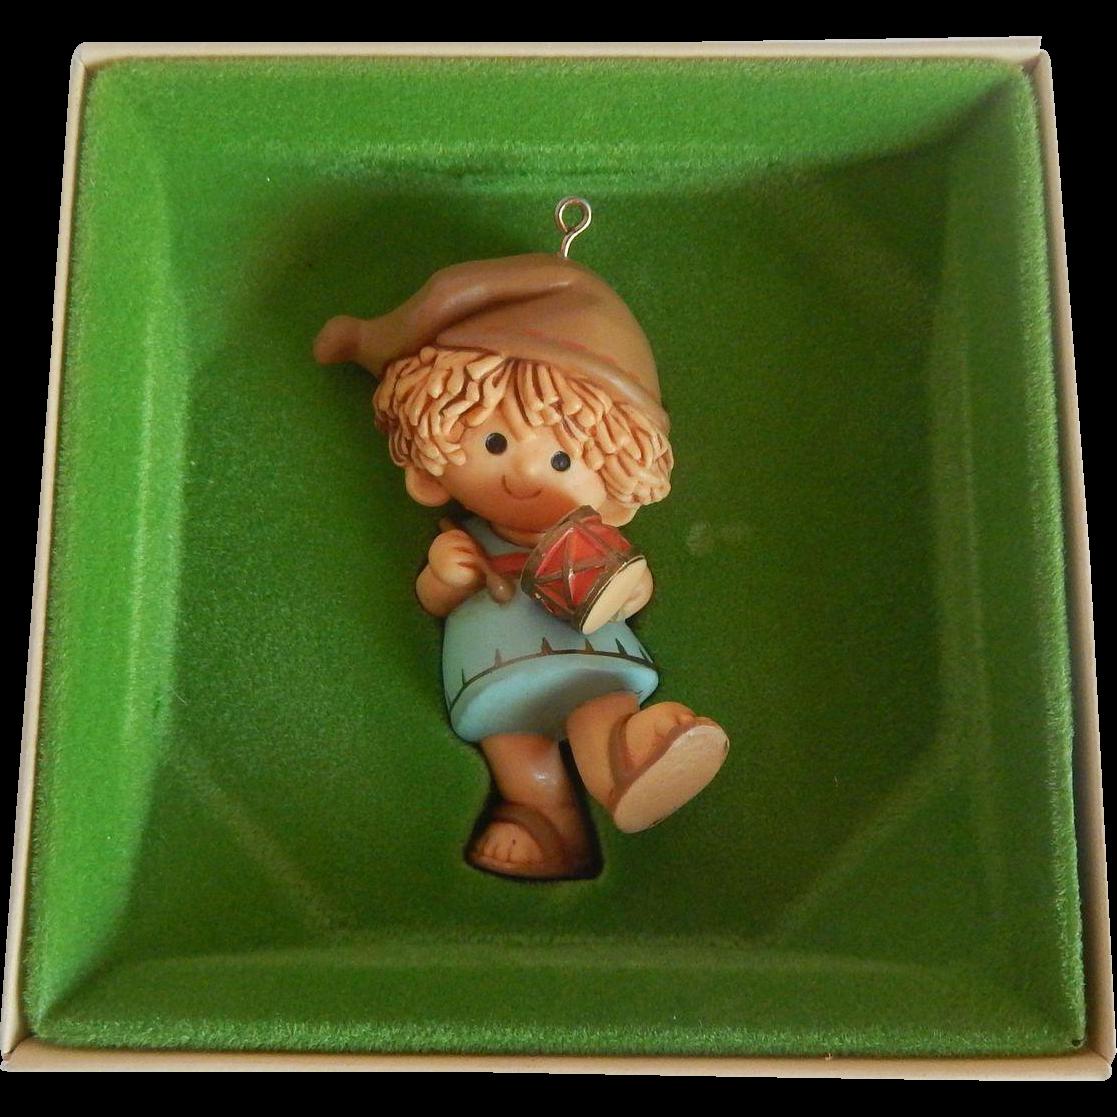 Hallmark 1980 Drummer Boy Christmas Ornament